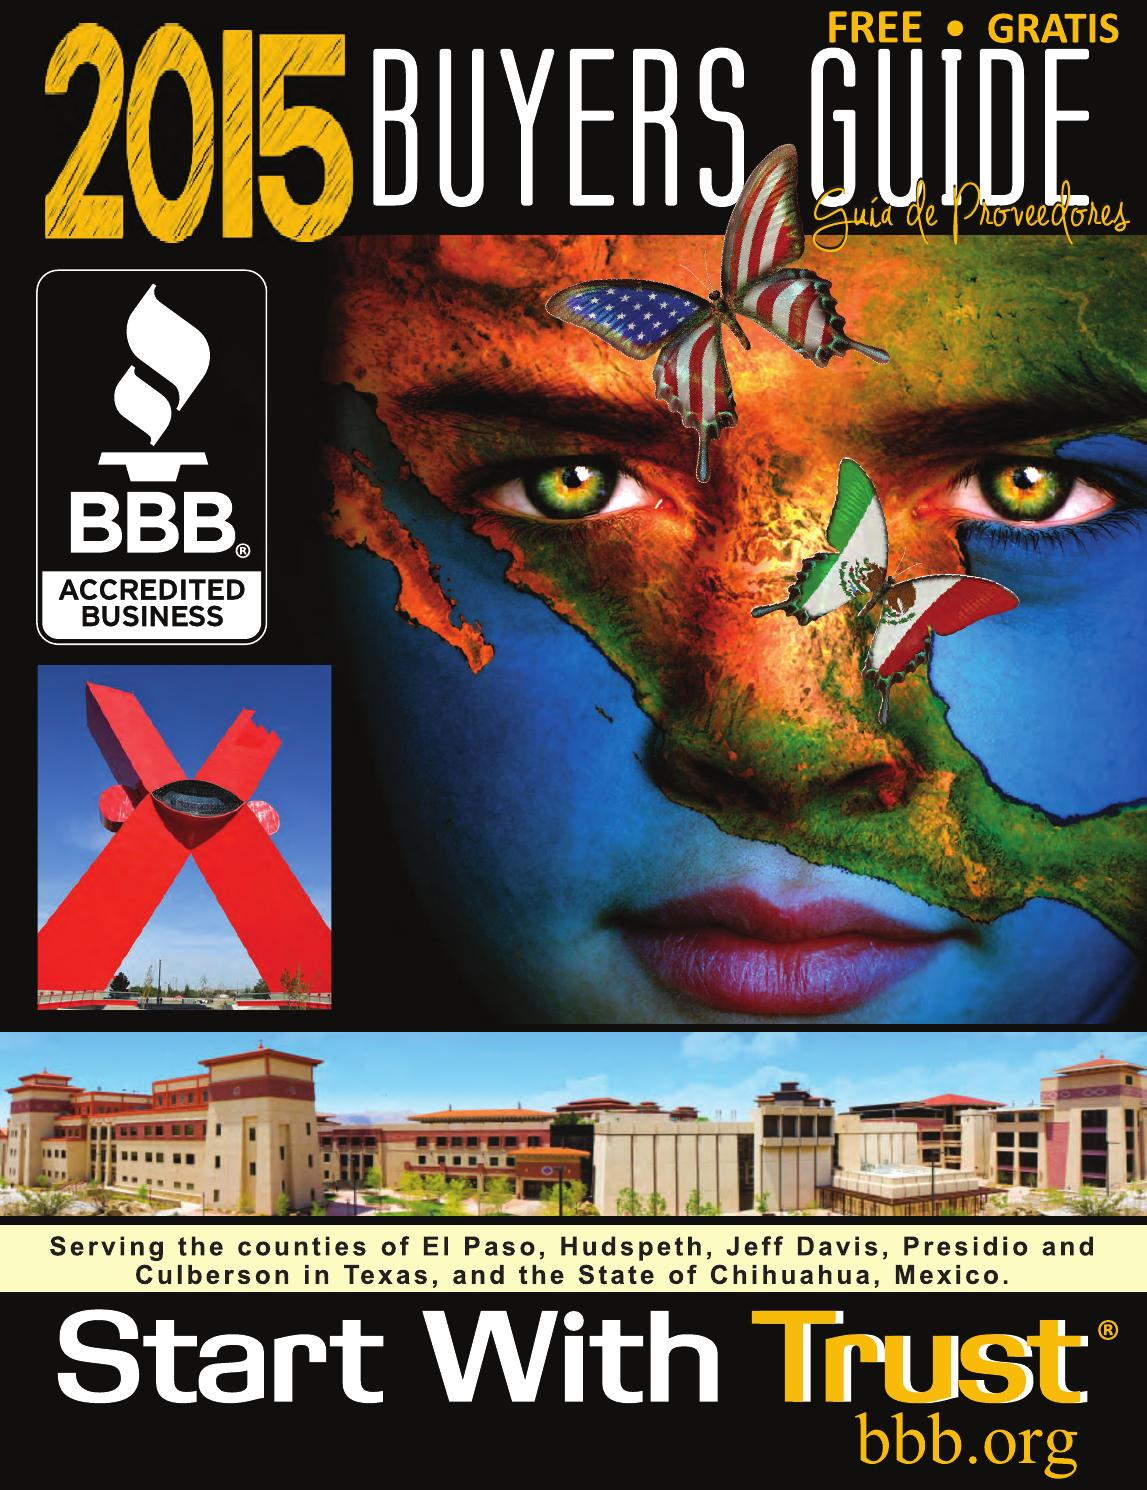 Amerus Roofing El Paso 2015 buyer's guidedigital publisher - issuu